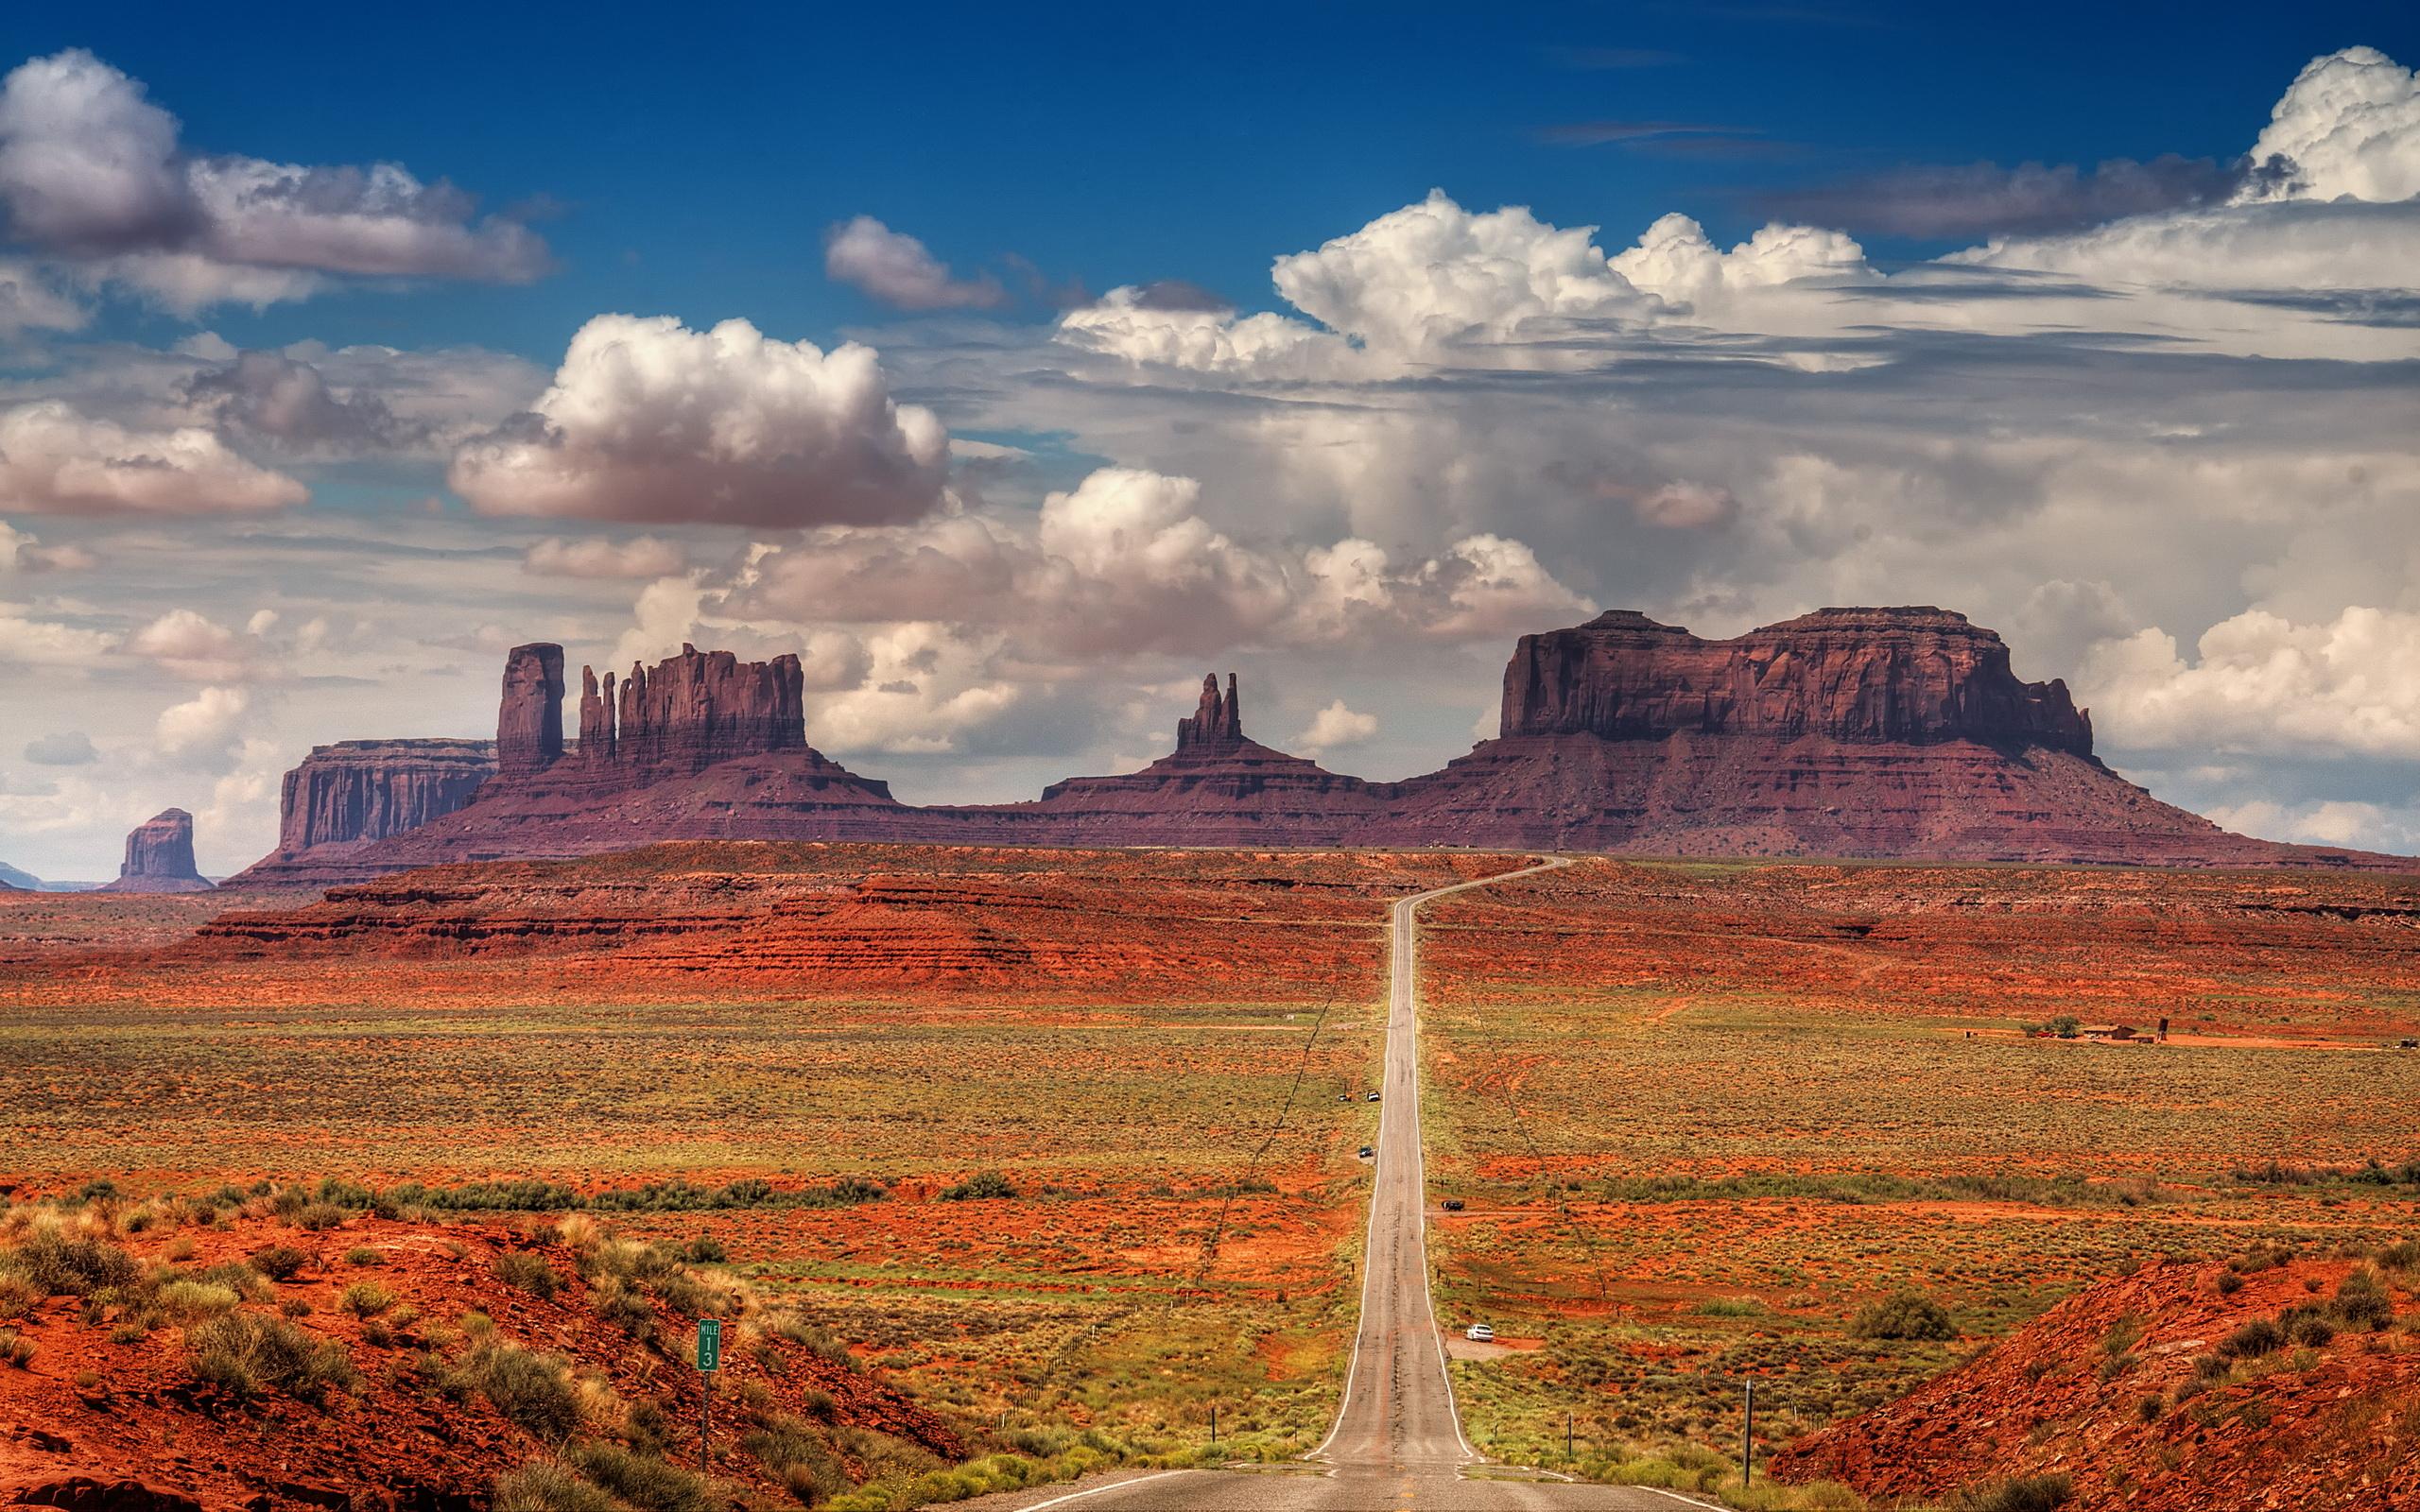 42 Arizona Desert Wallpaper Hd On Wallpapersafari